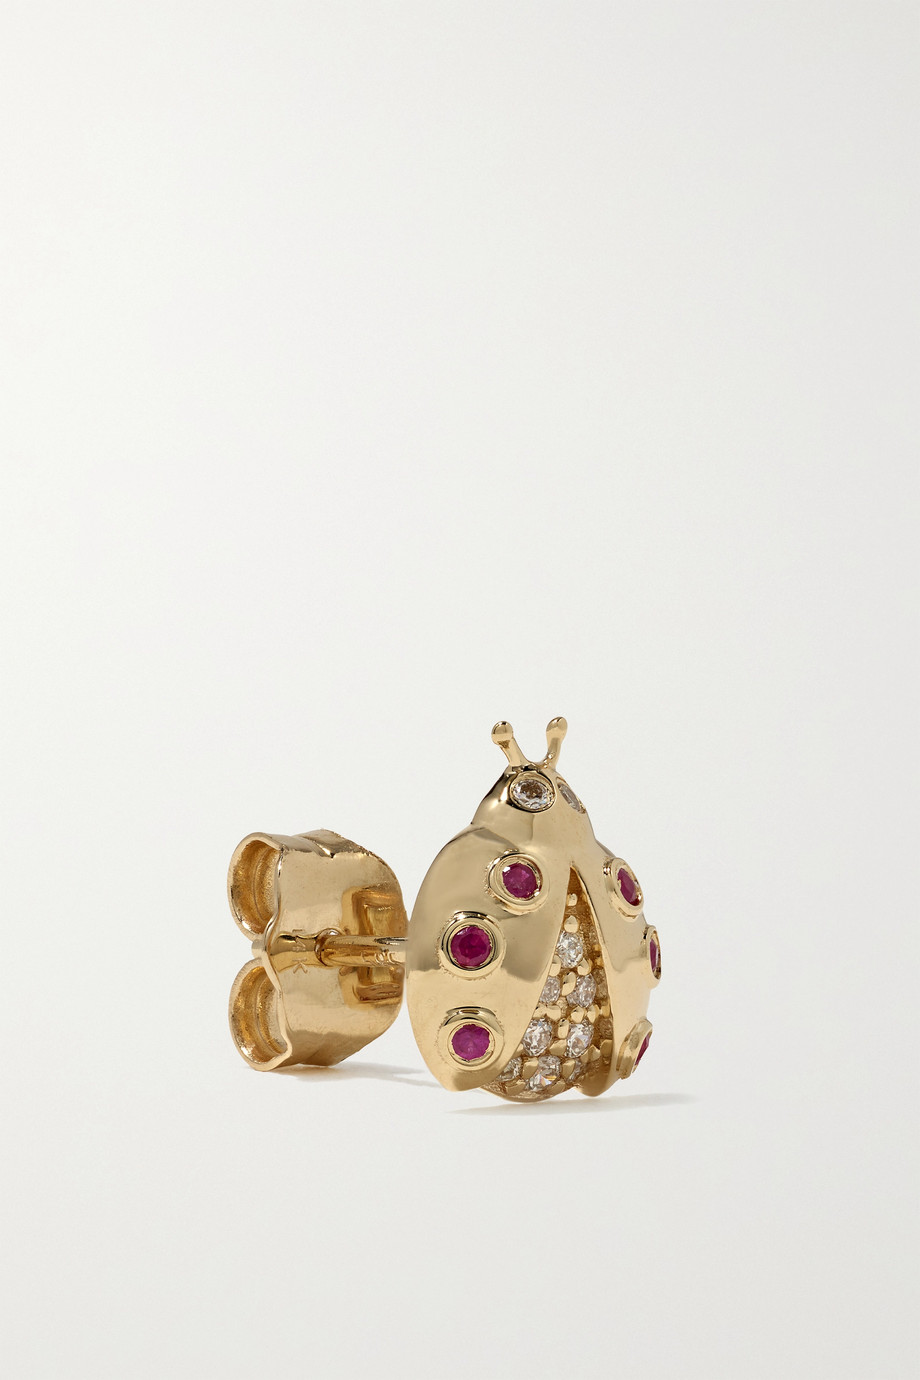 Sydney Evan Small Ladybug 14-karat gold, ruby and diamond earrings